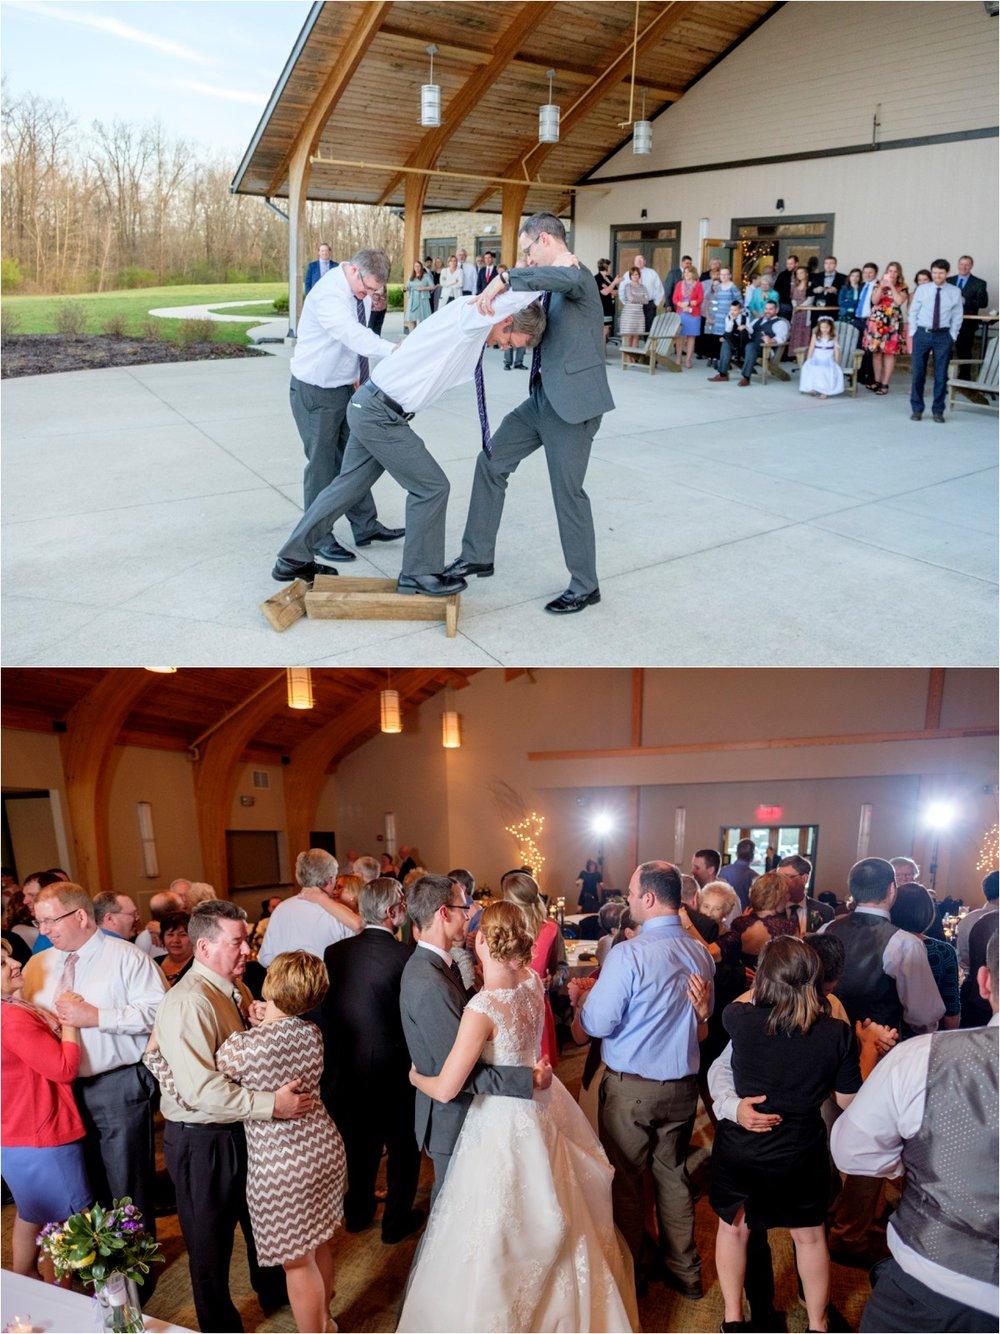 Plainfield-Christian-Church-Washington-Township-Park-Pavilion-Wedding-Pictures_0026.jpg